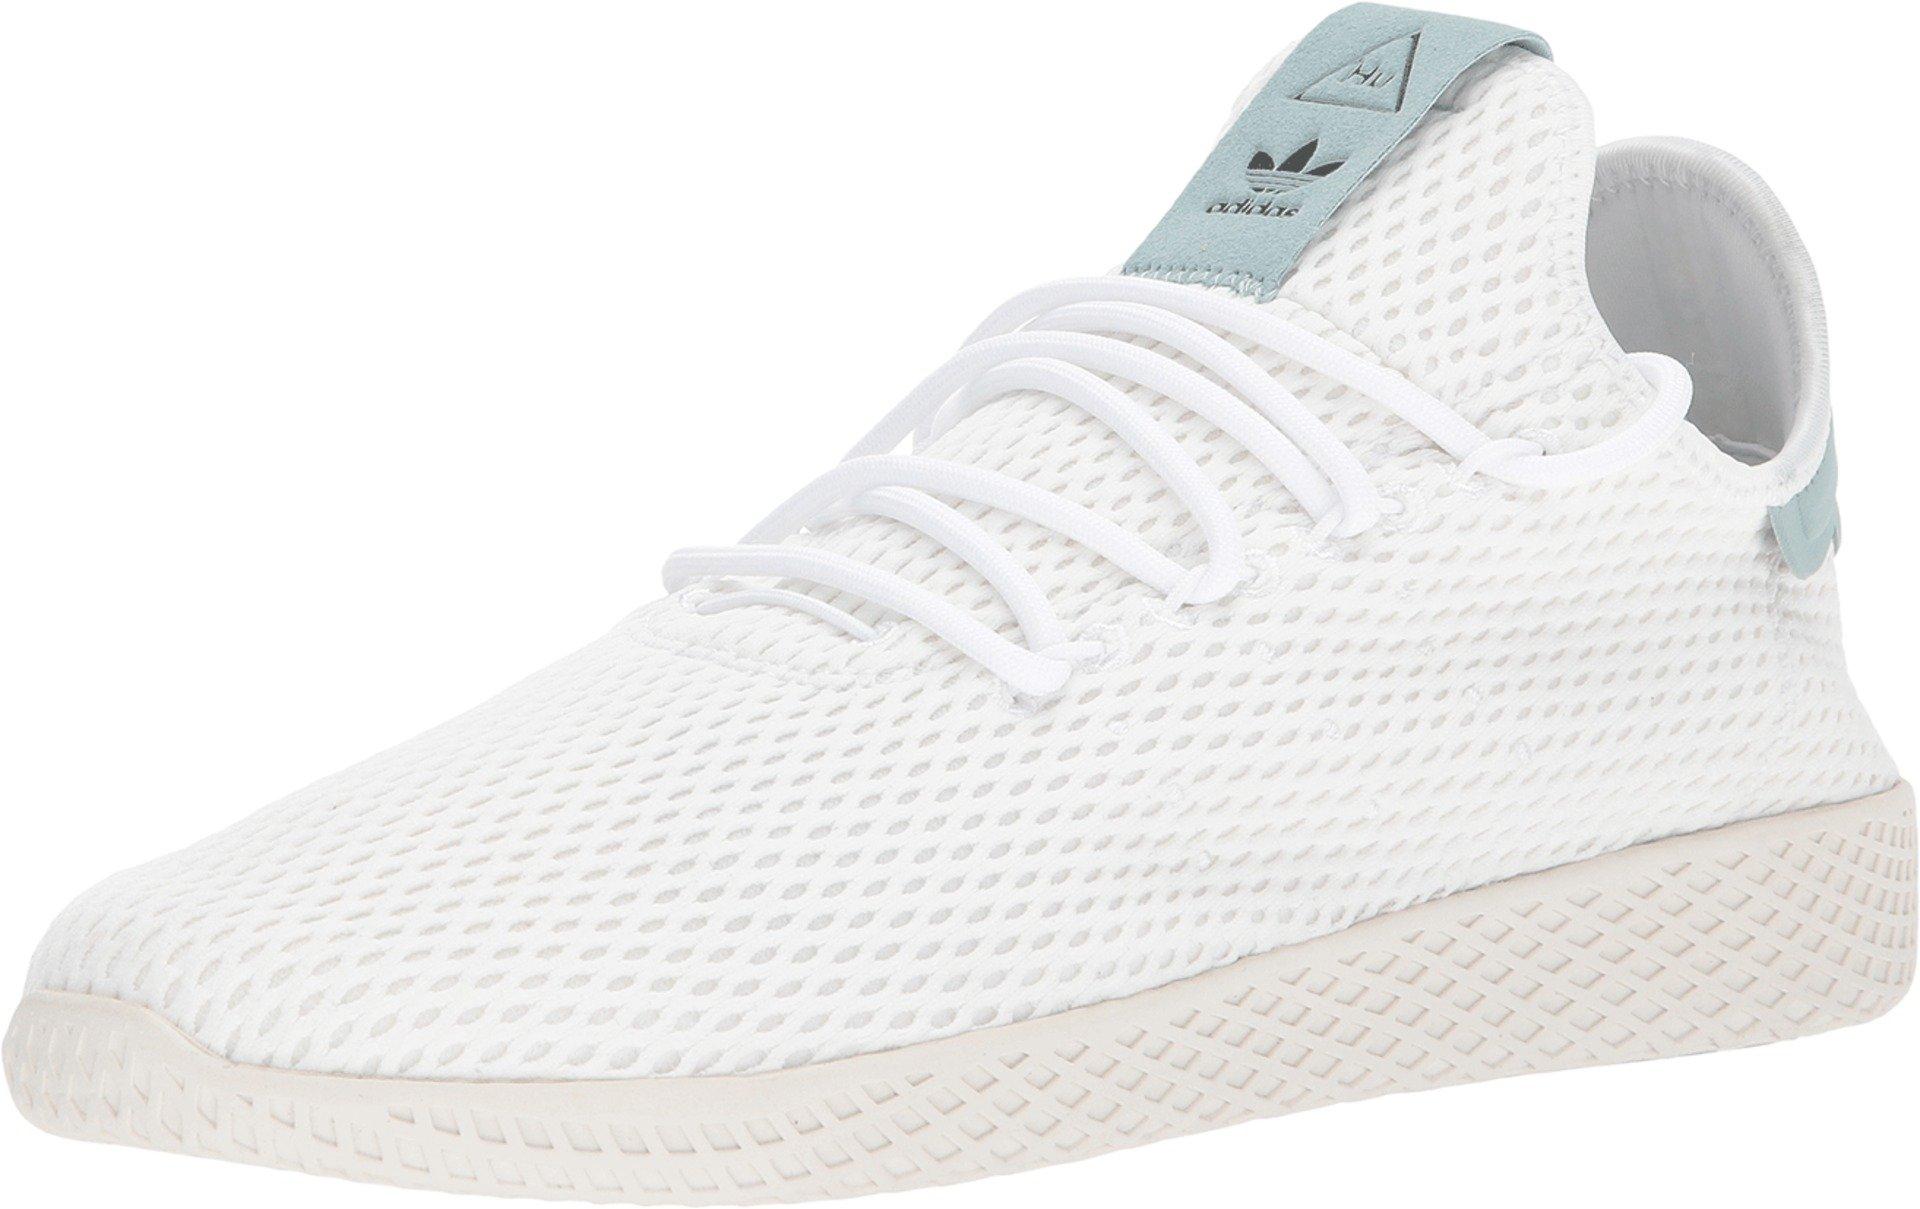 pretty nice 9f7fc 579b5 adidas Originals Men's Pharrell Williams Human Race White/White/Green 8 D US